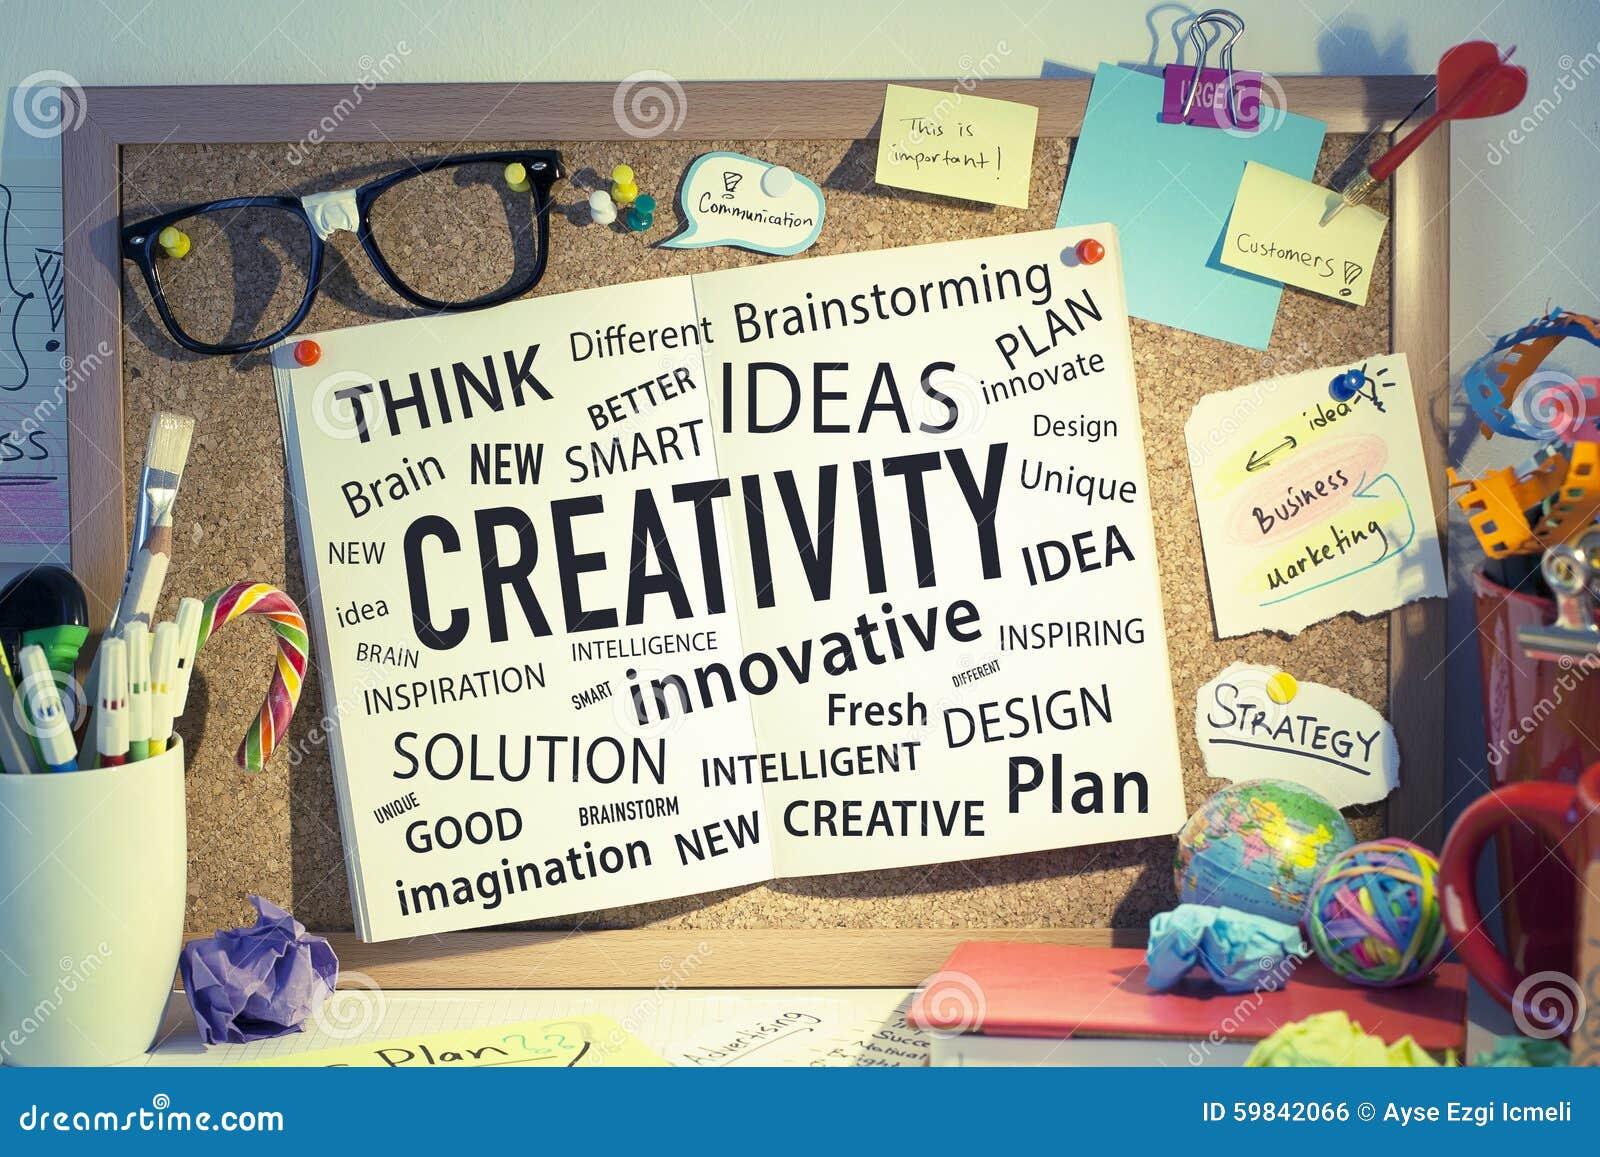 Creativity Innovation Ideas Business Solutions Stock Photo ...